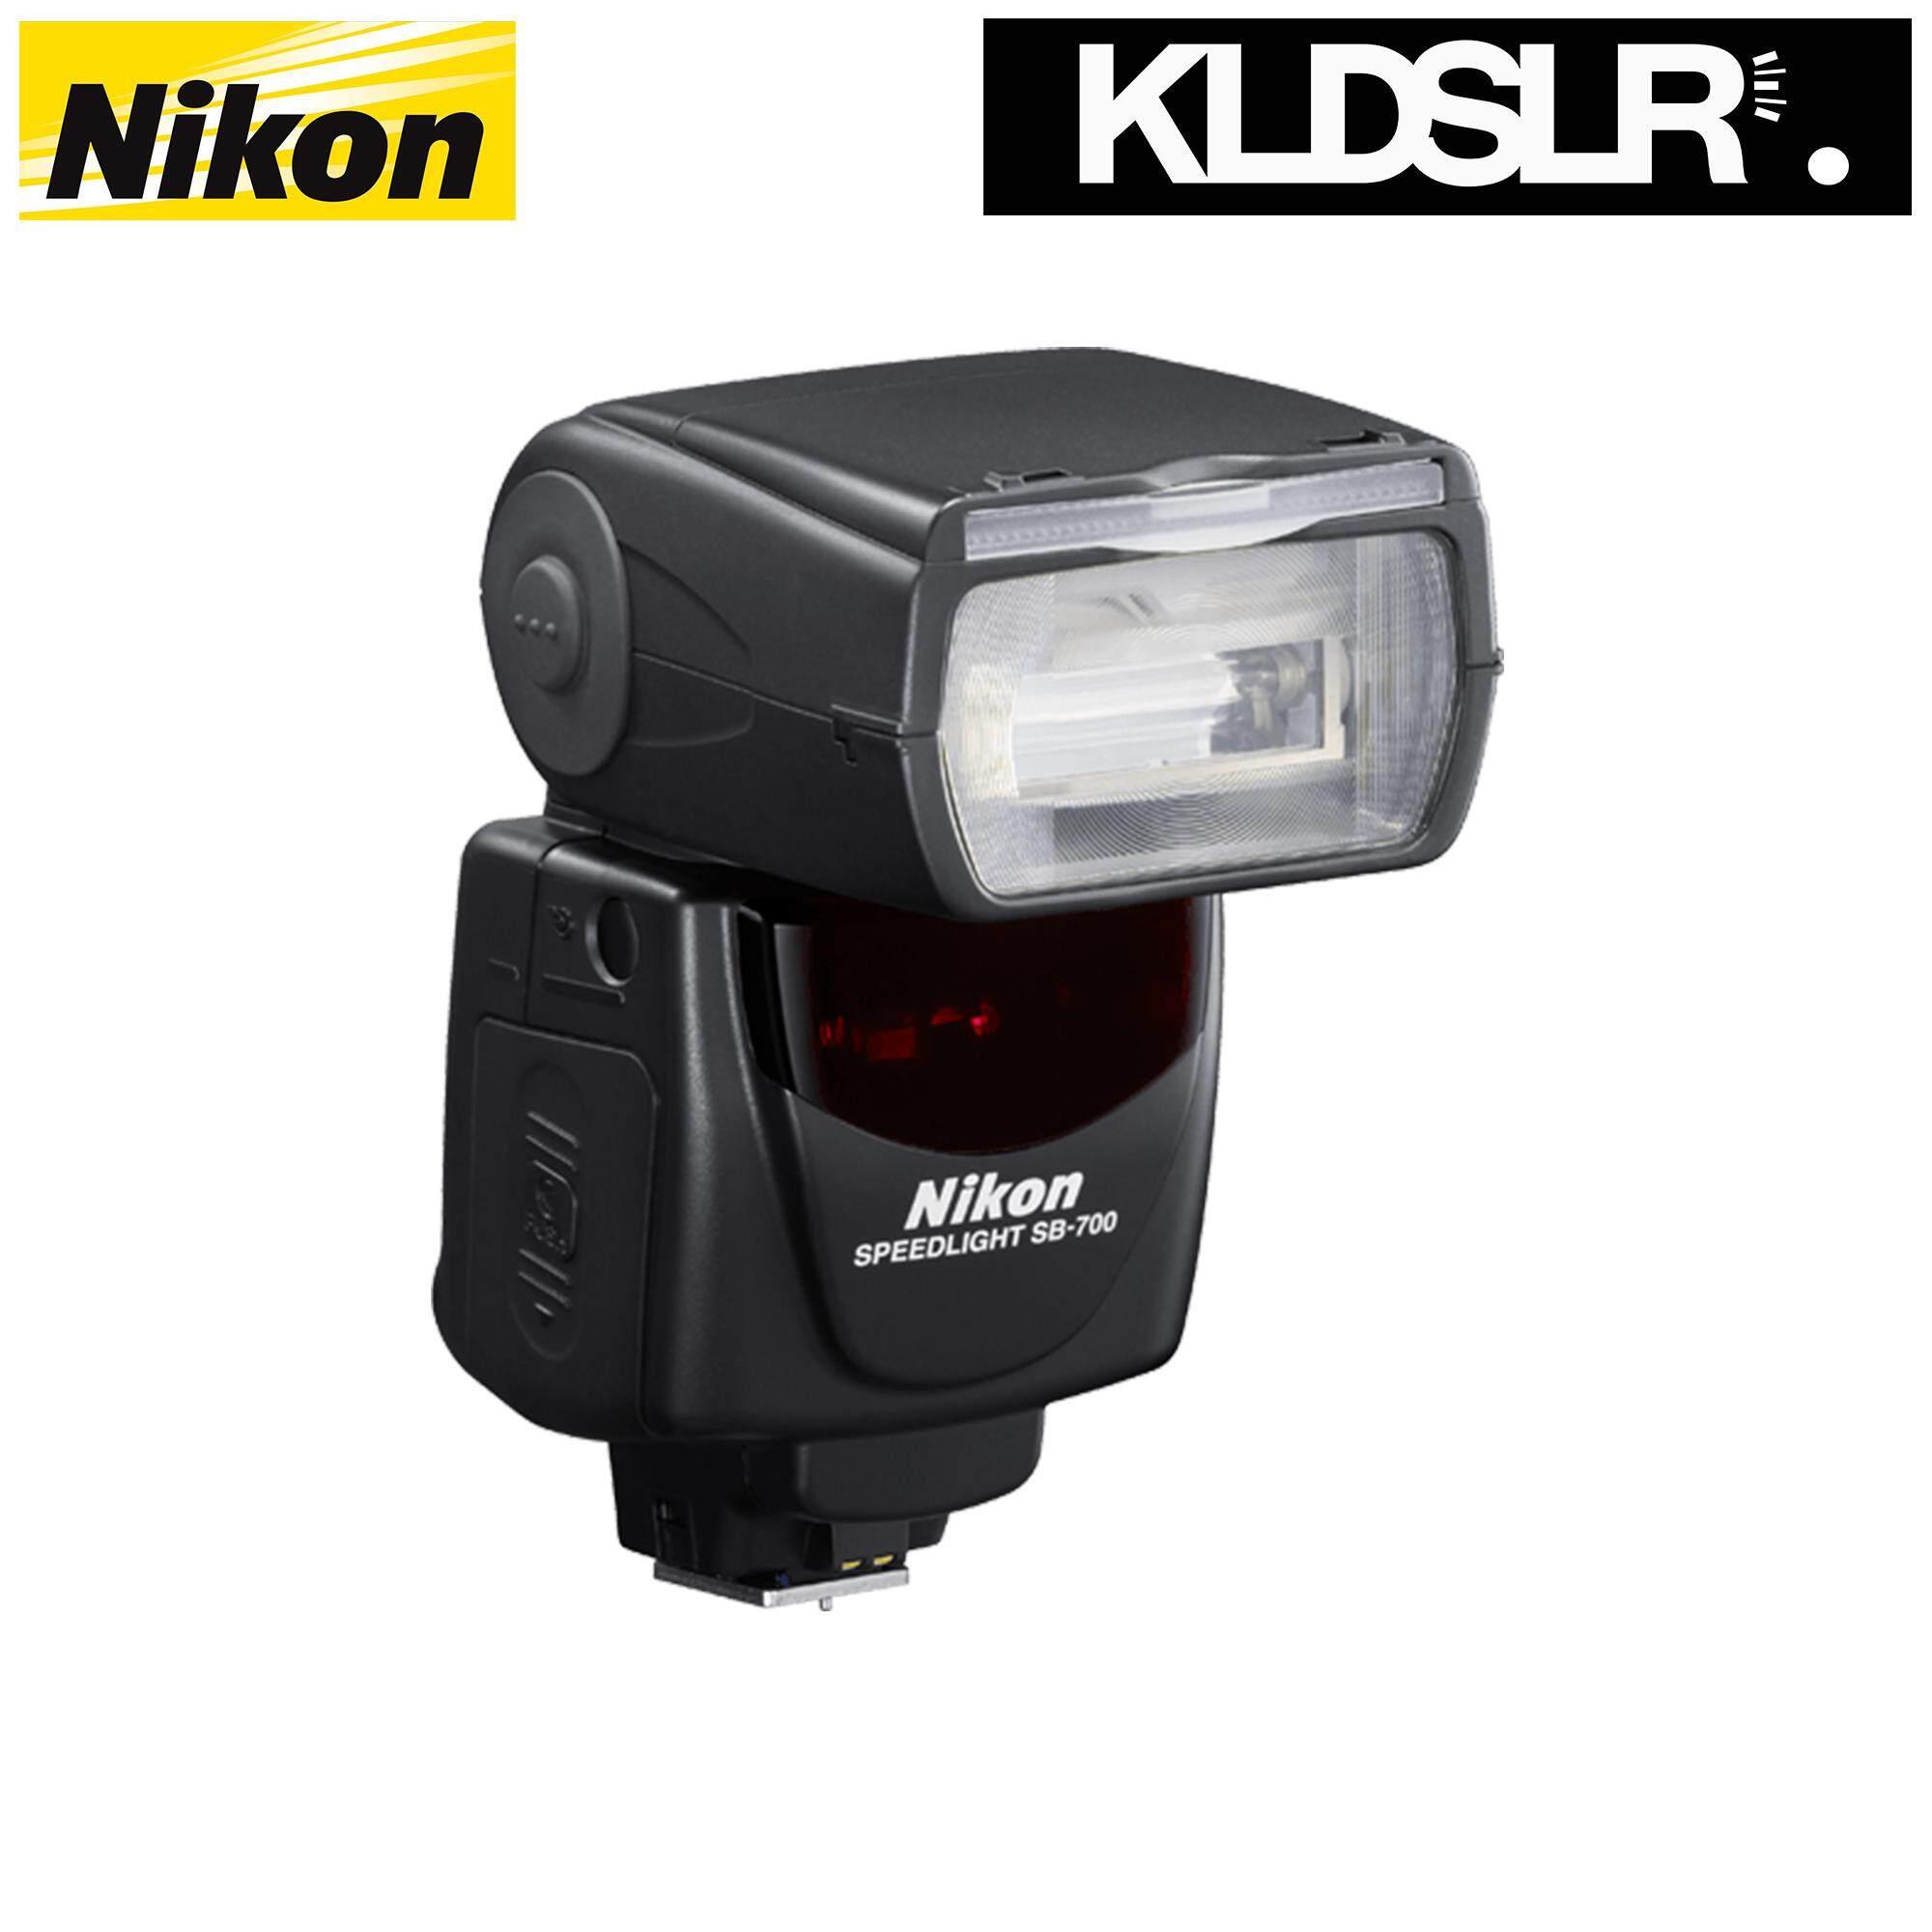 Buy Camera Flashes At Best Prices Lazada Malaysia Free Shipping Tutup Body Lensa Nikon Dslr Sb 700 Af Speedlight